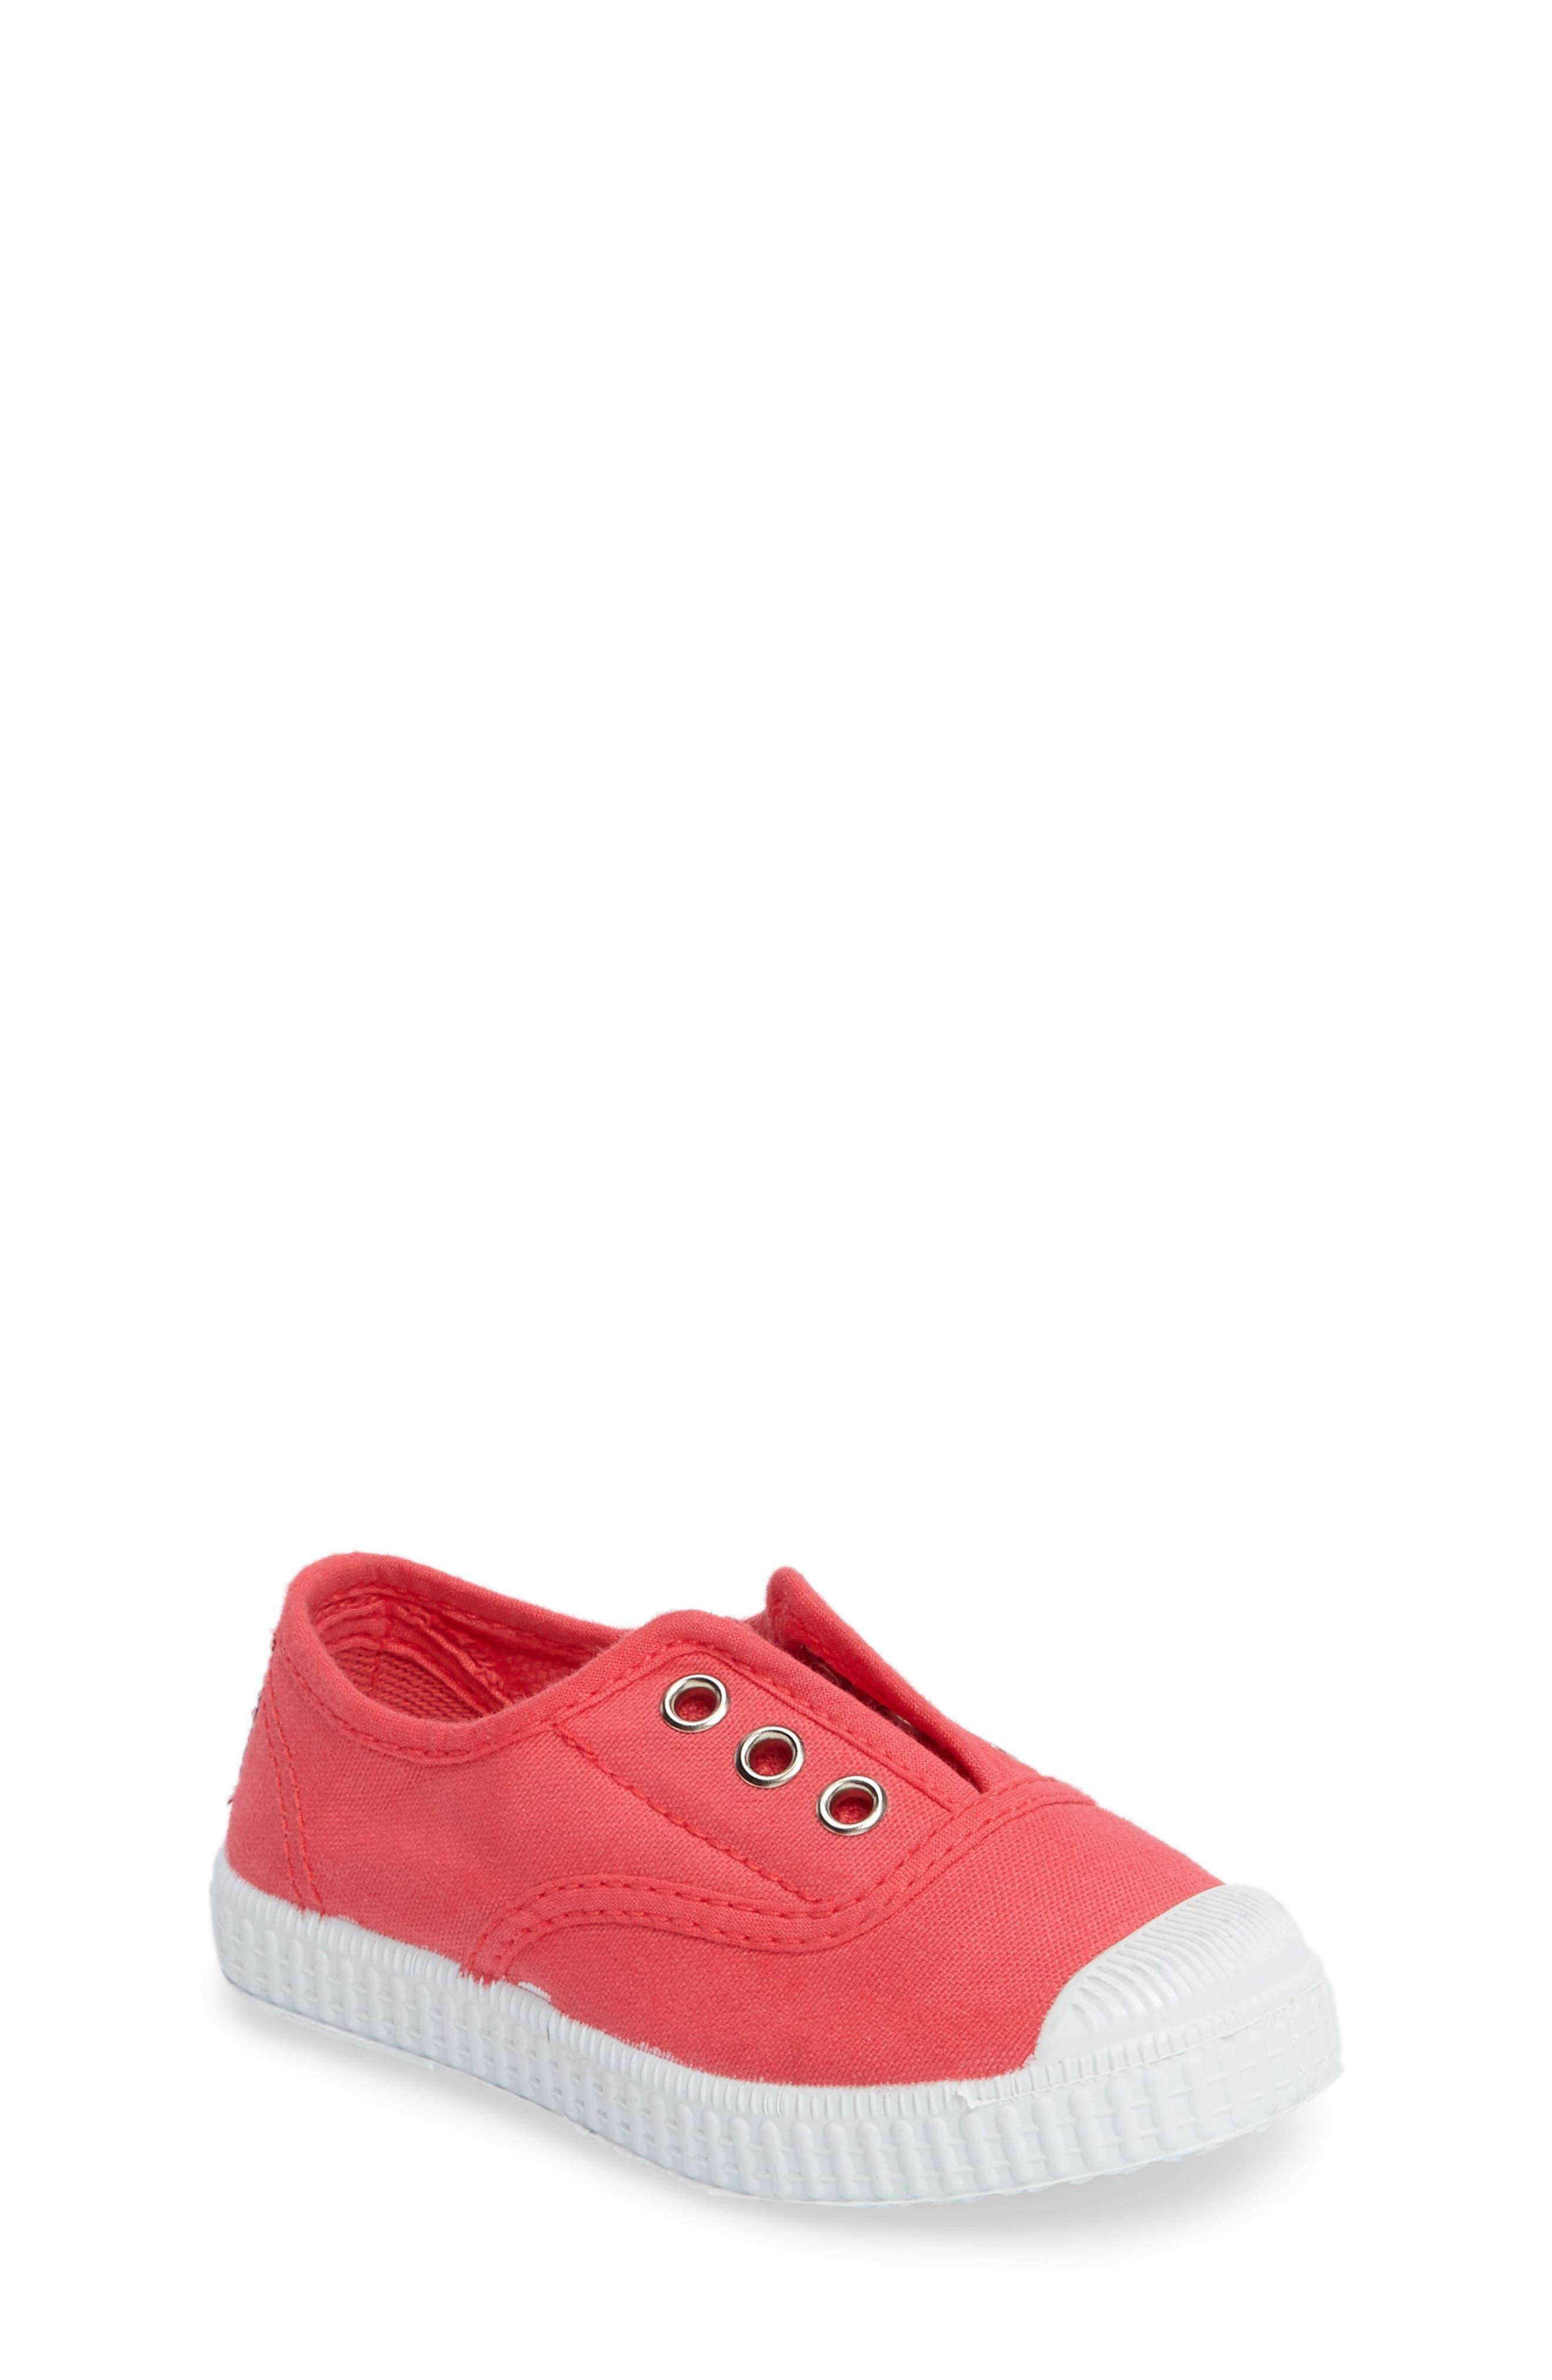 Main Image - Cienta Laceless Slip-On Sneaker (Walker & Toddler)